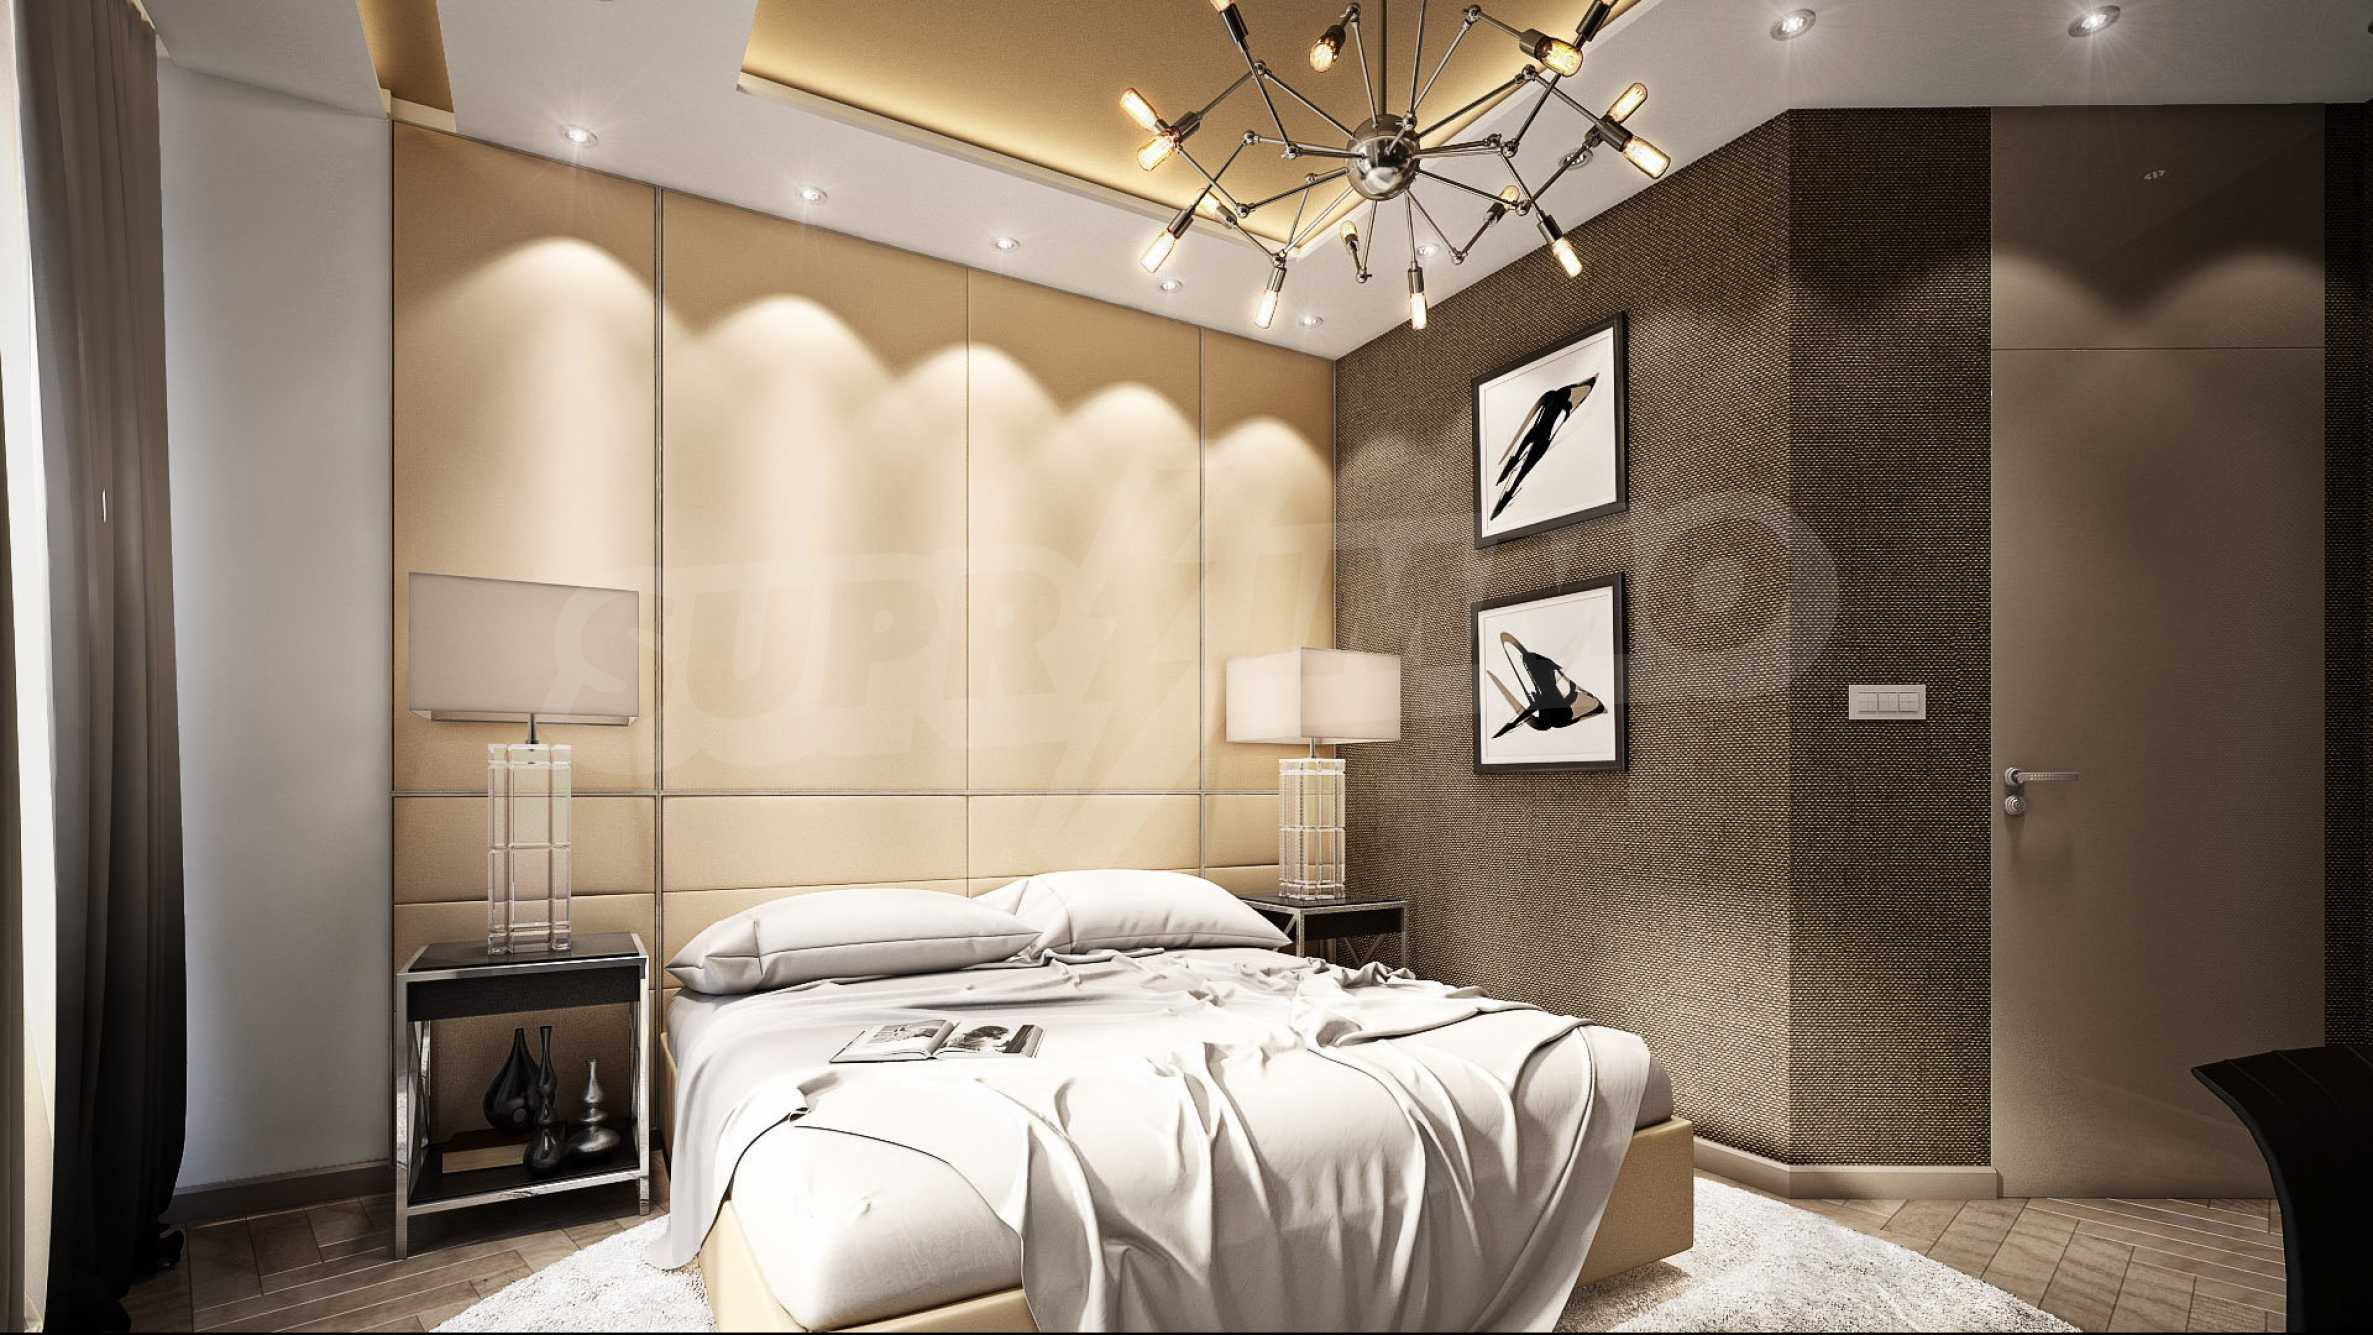 Нова сграда с луксозни апартаменти в гр. Бургас 59